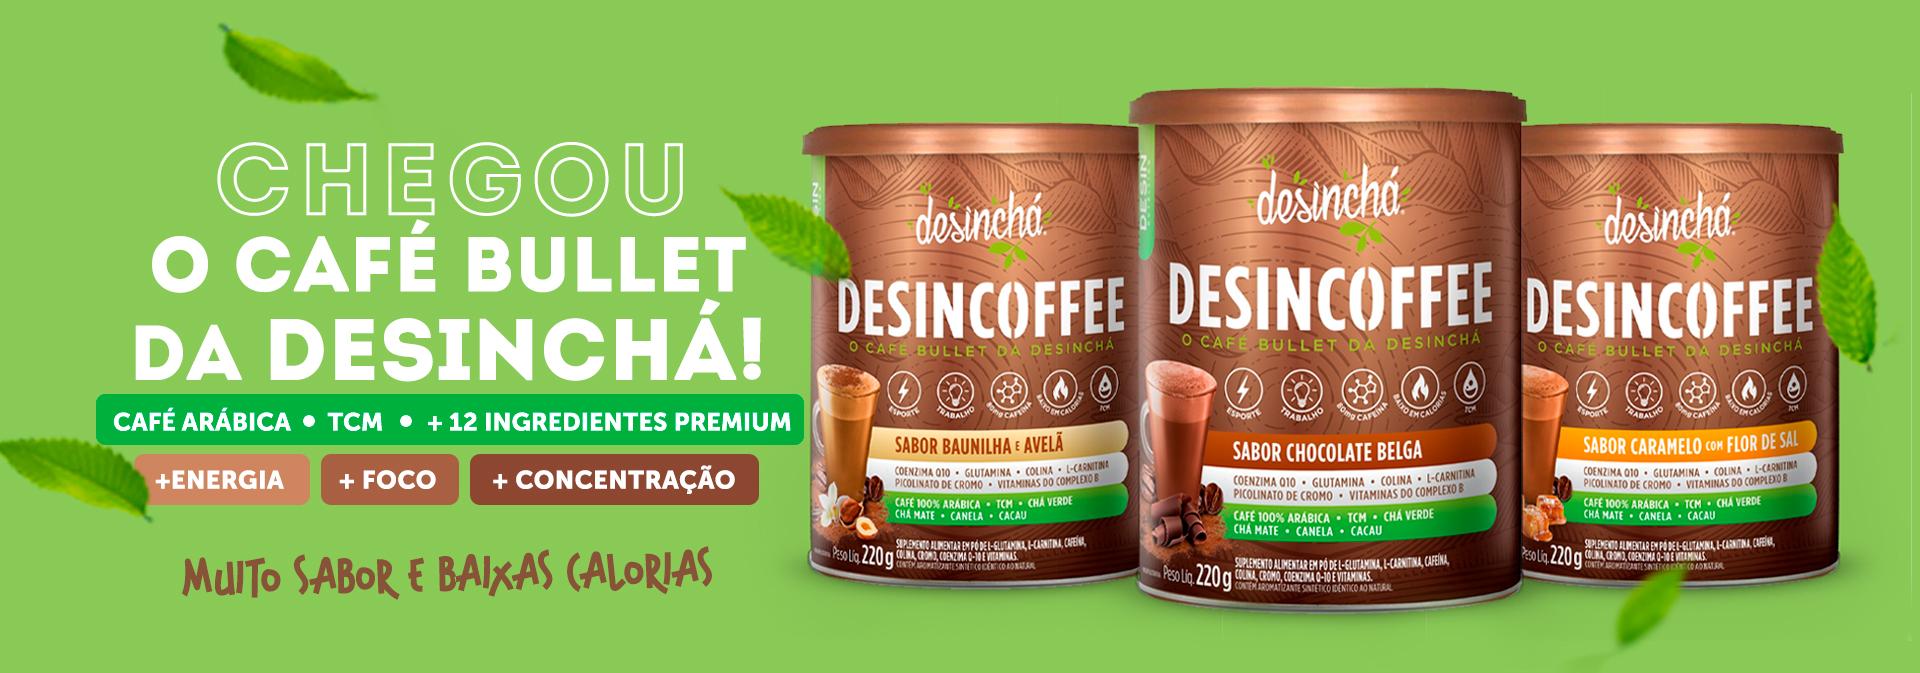 banner-home-desincoffee